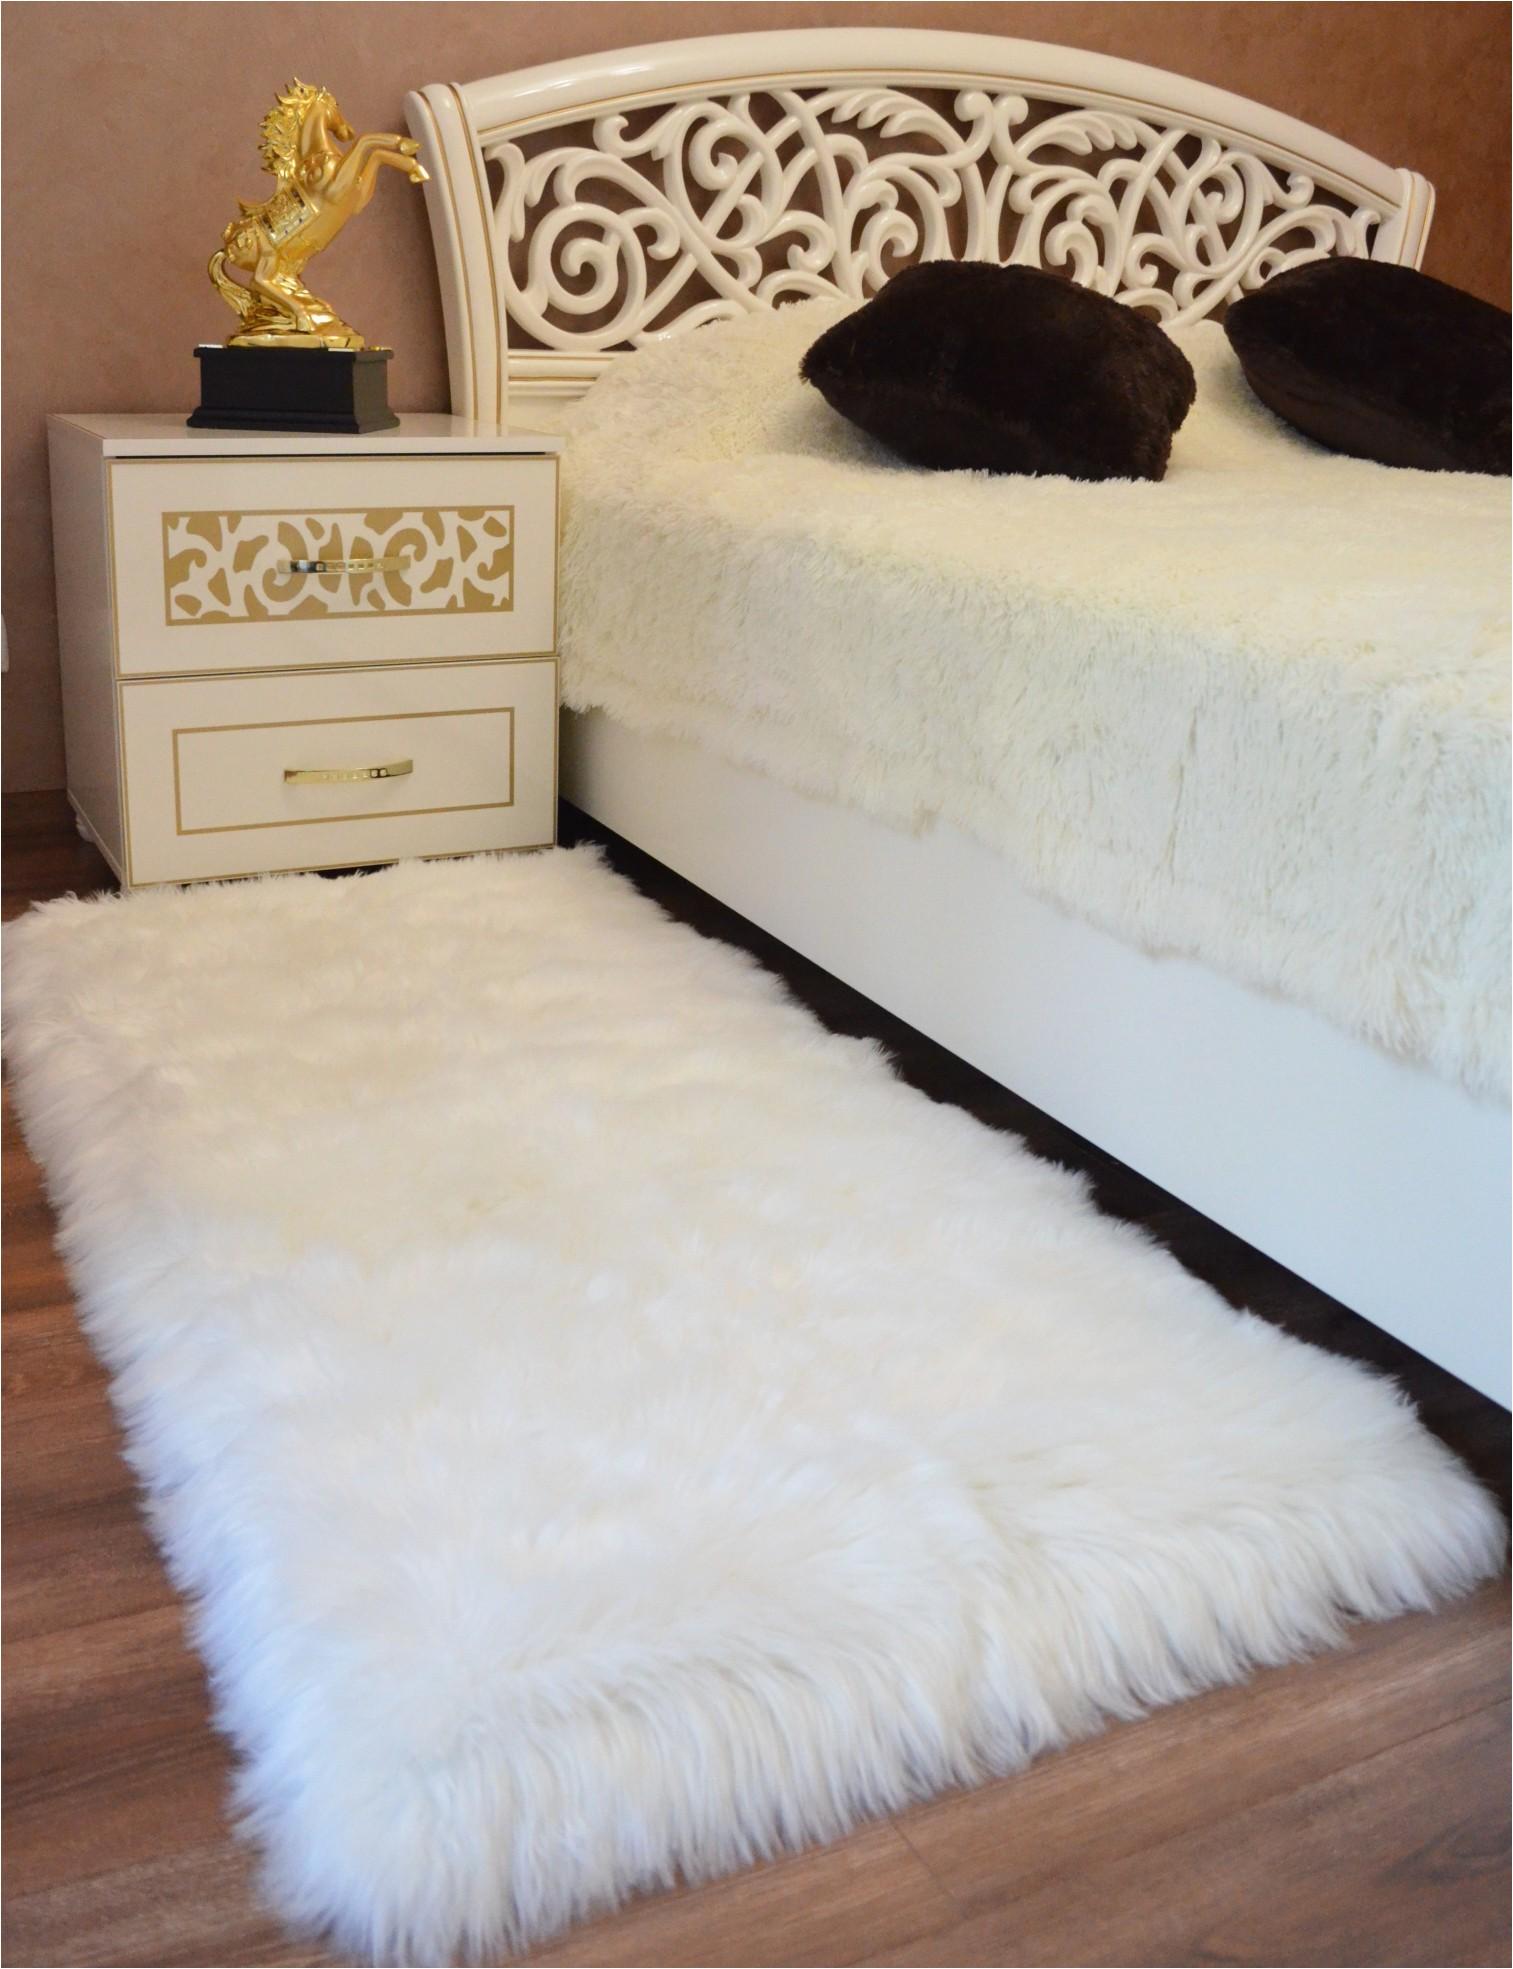 premium faux sheepskin fur rug white 2 3x5 feet best extra long shag pile carpet for bedroom floor sofa soft fur area rug